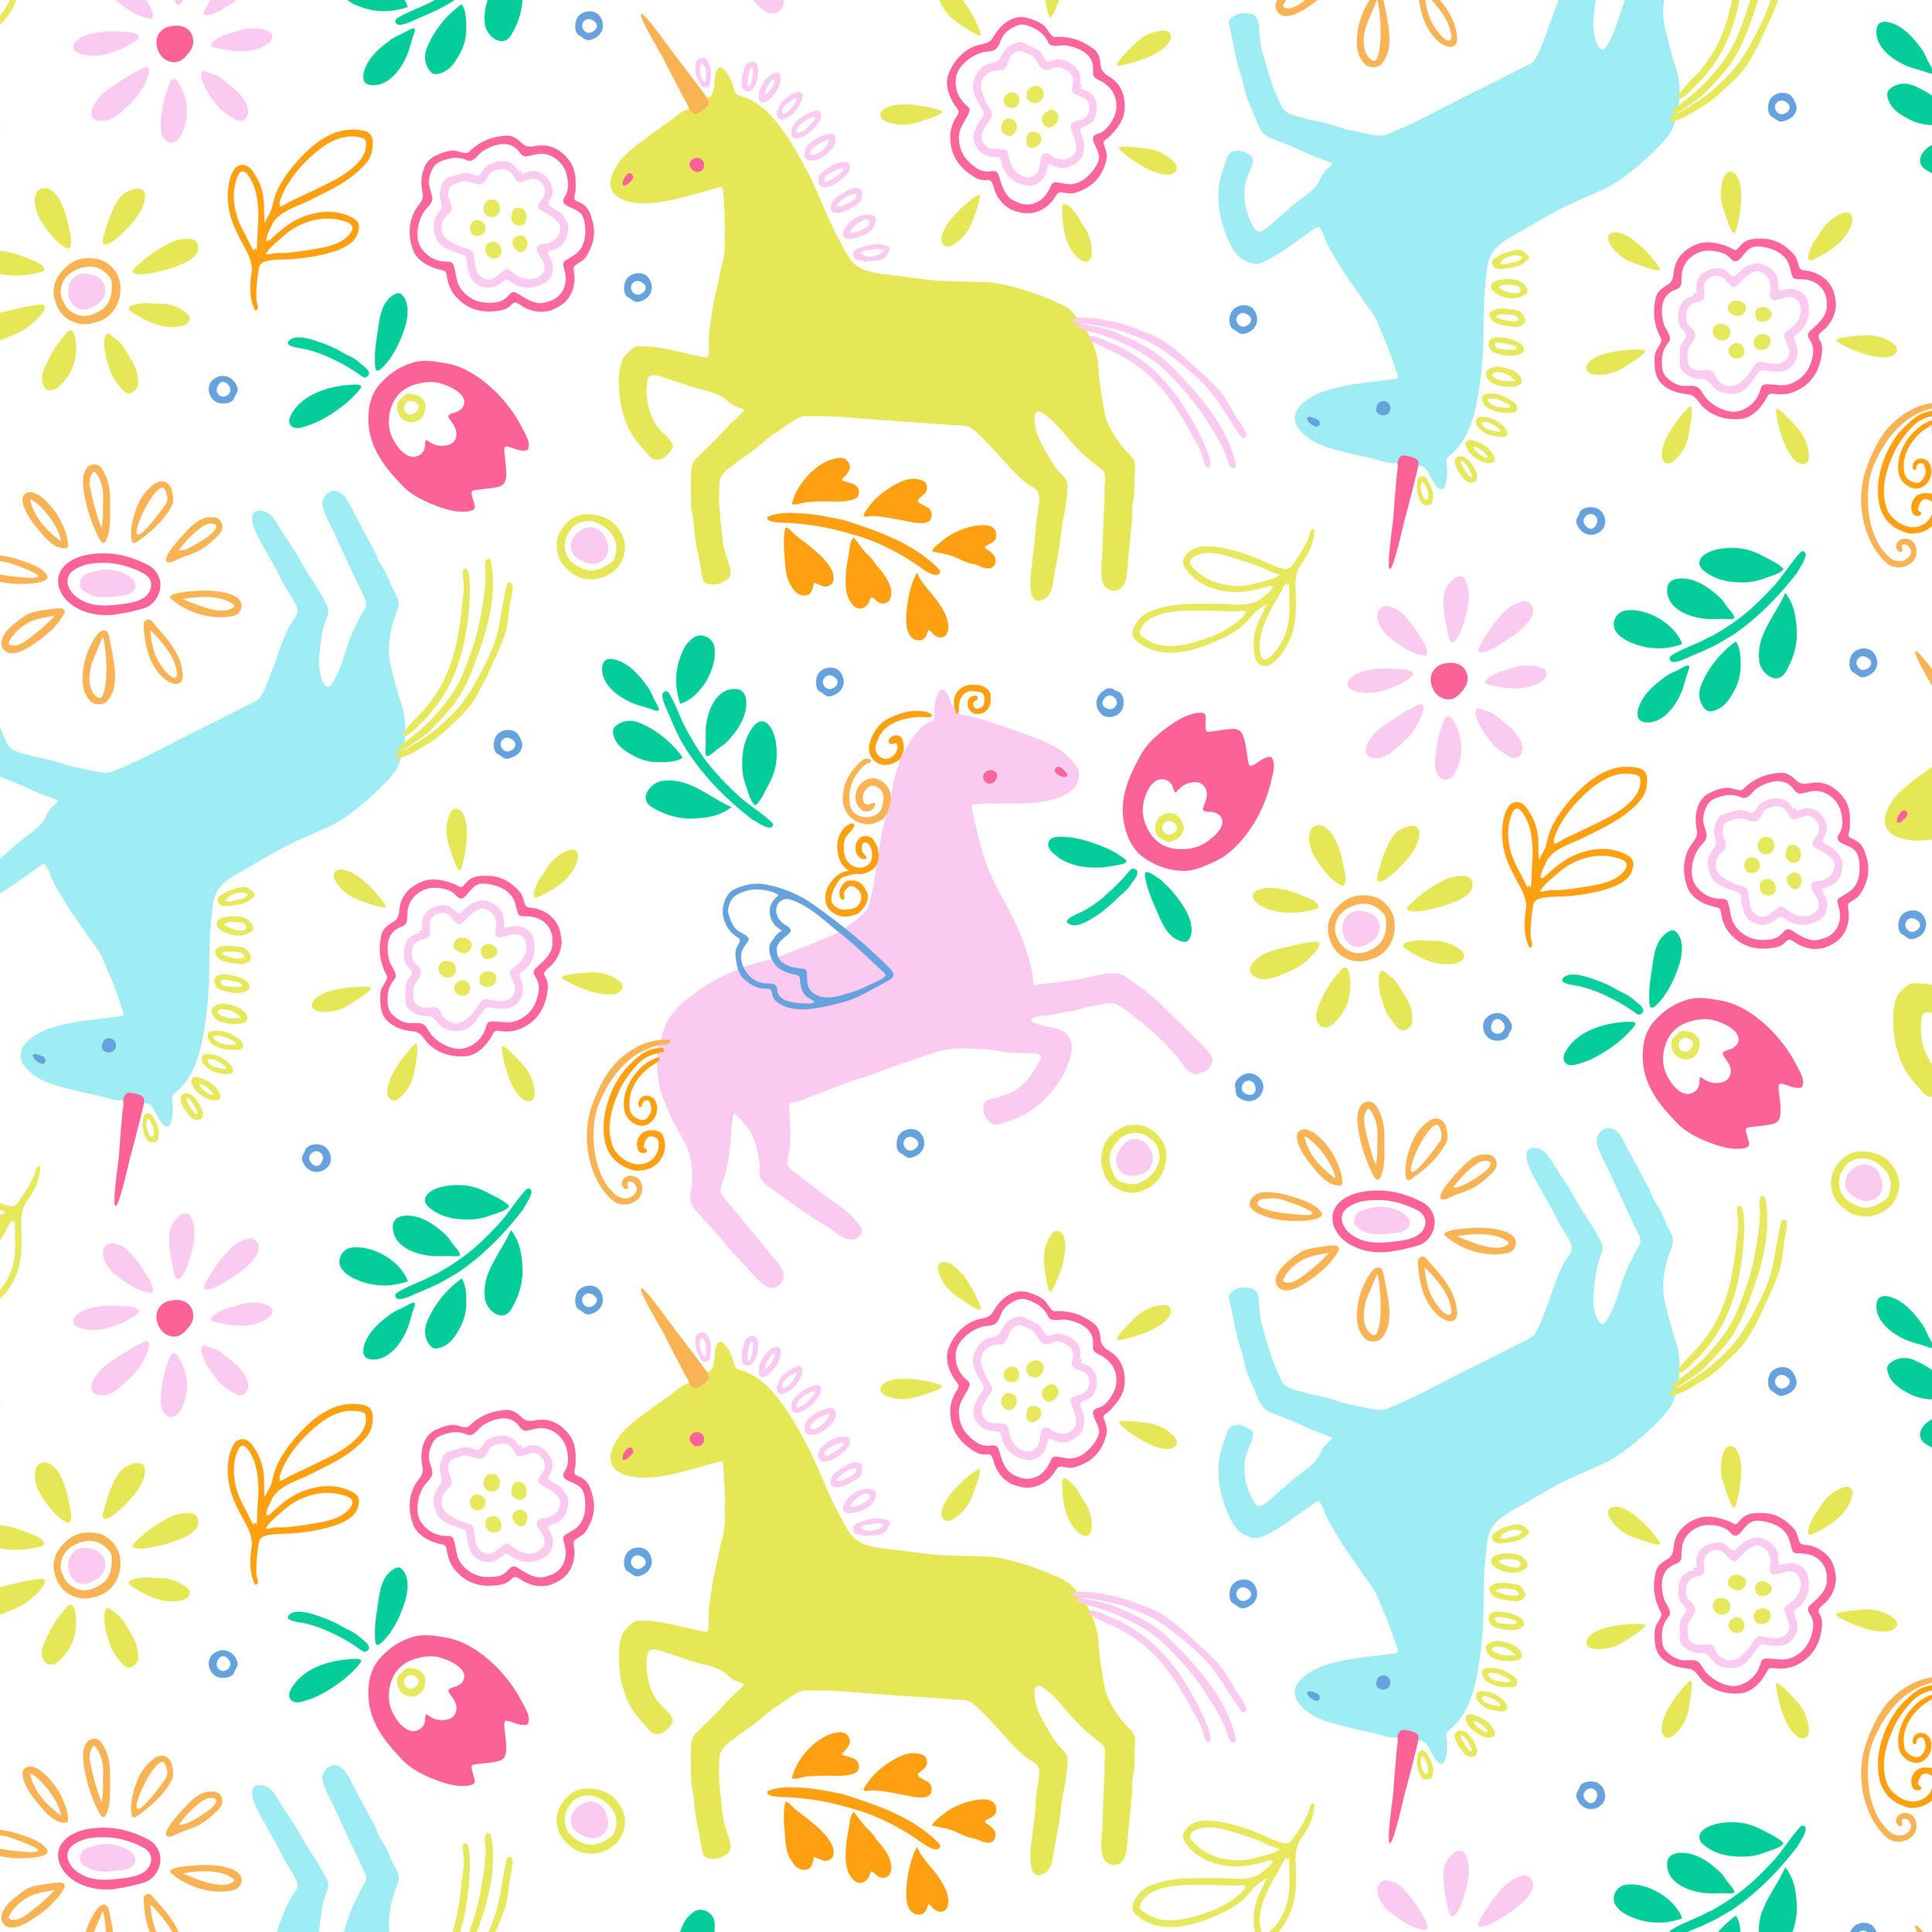 original childrenswear print sold through Five Points Graphics